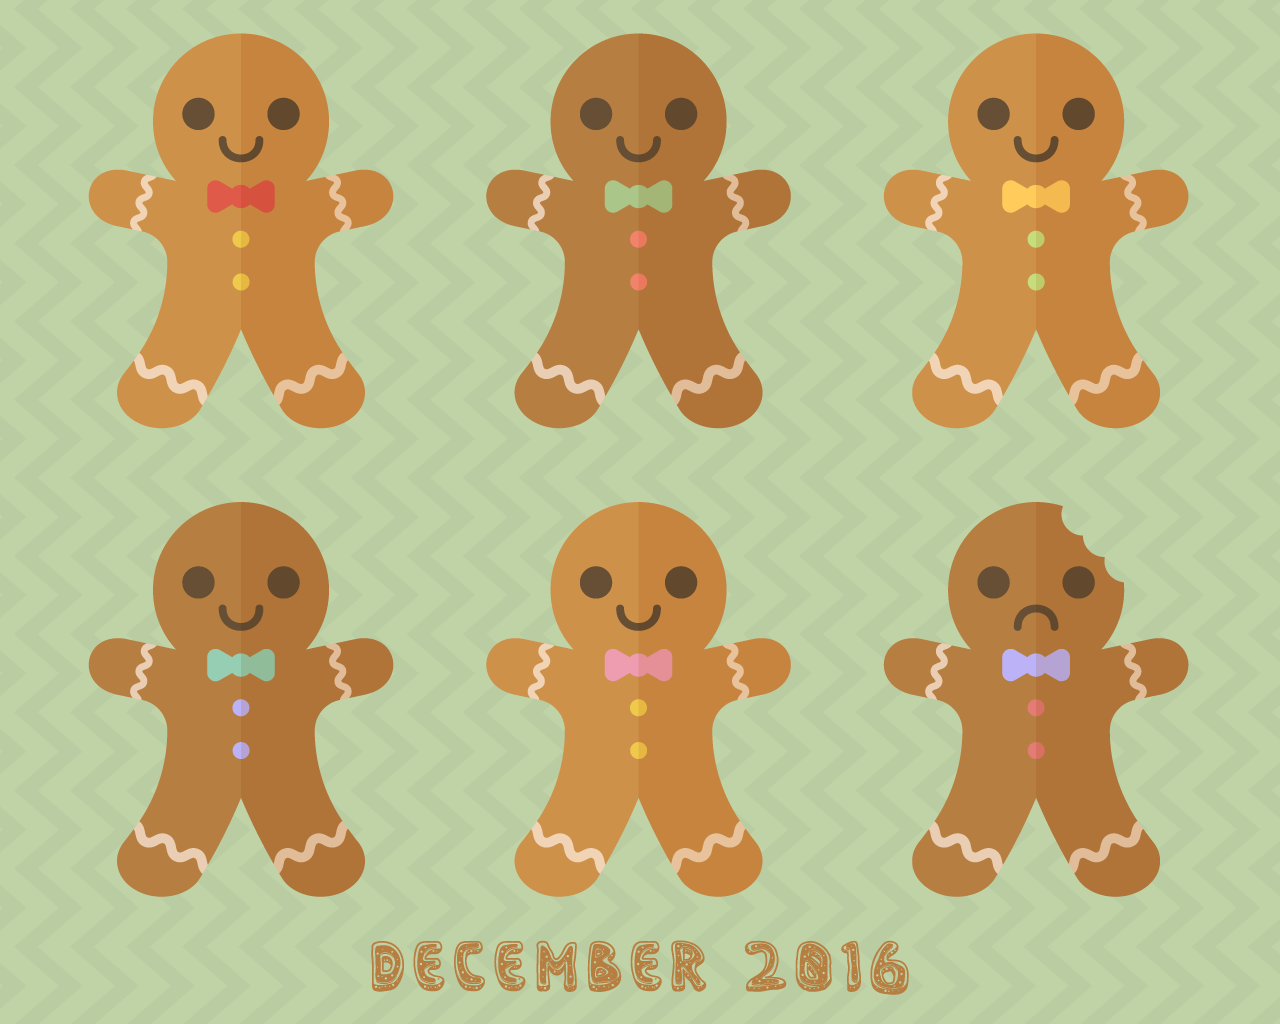 december-2016-l